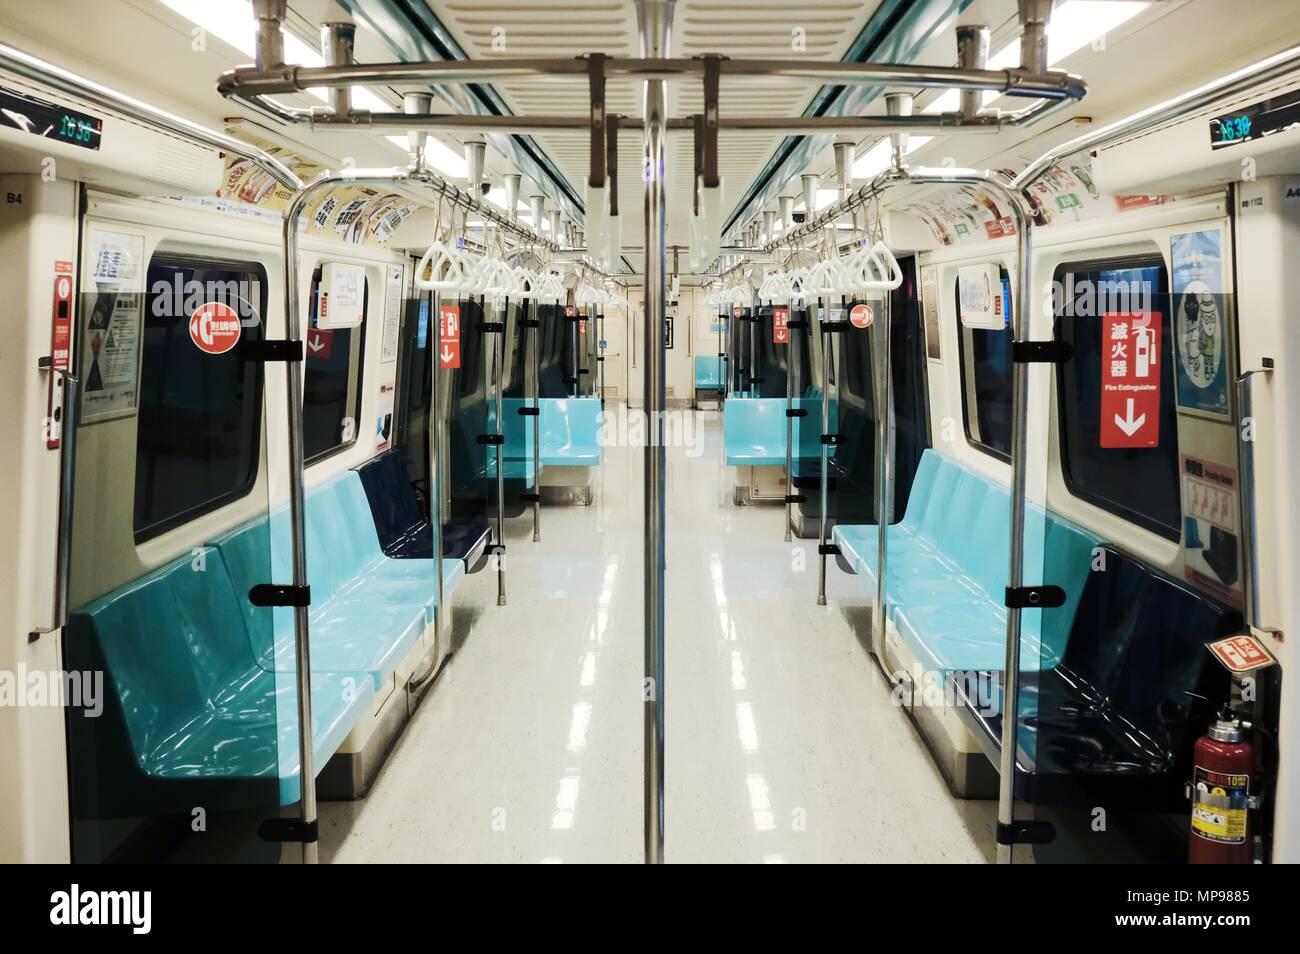 Taipei MRT Stock Photo: 185830181 - Alamy